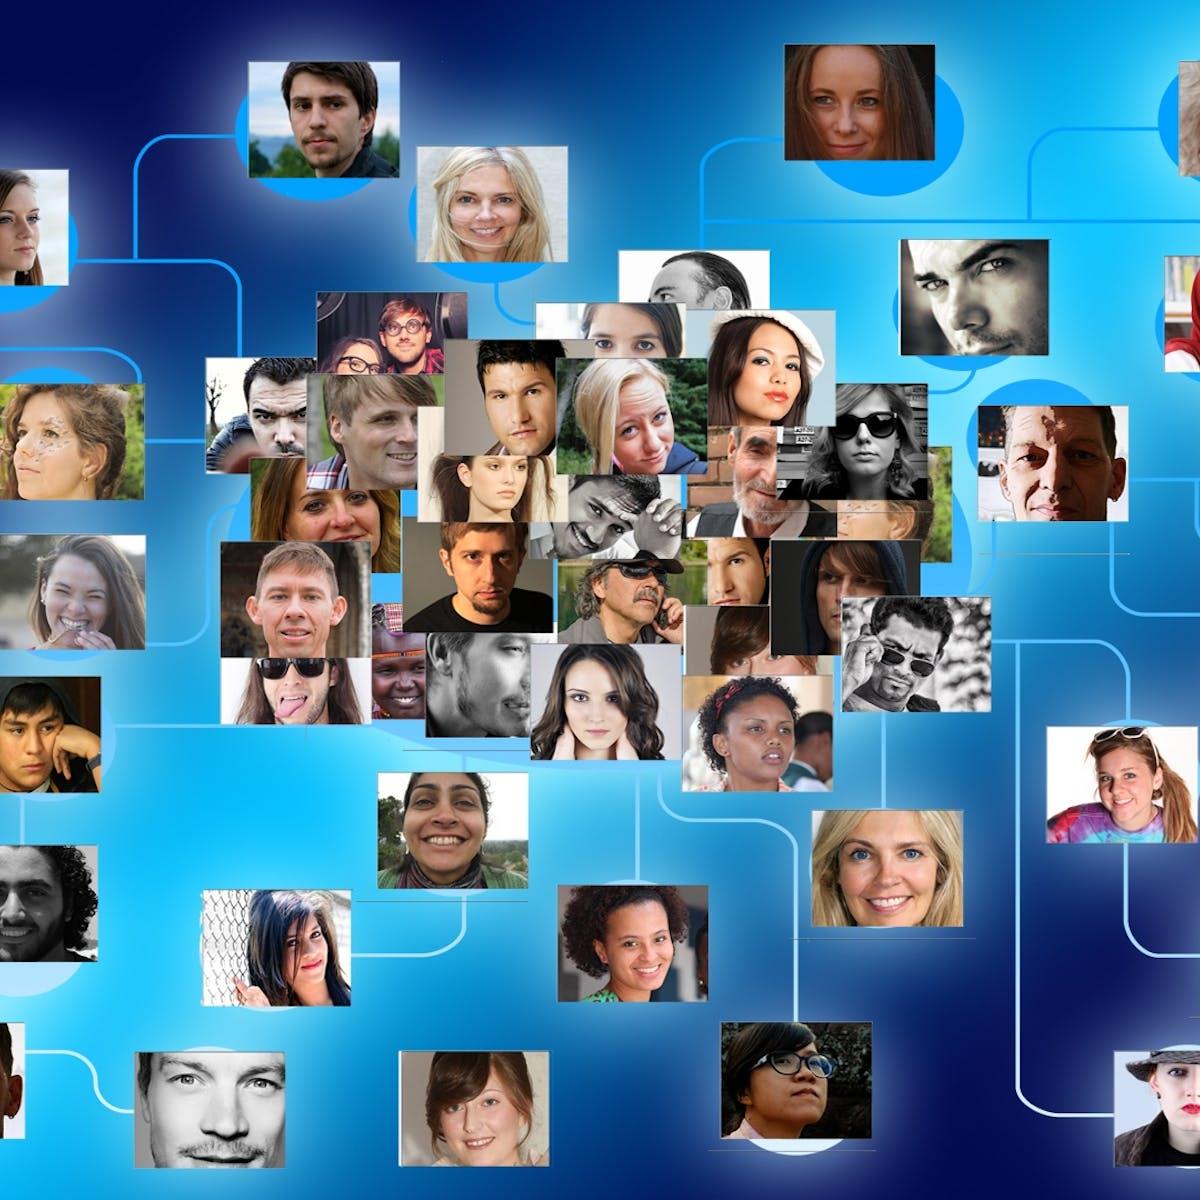 Titelbild-Collaboration-Tools-Vernetzung-Gesichter-System-927147-pixabay-geralt